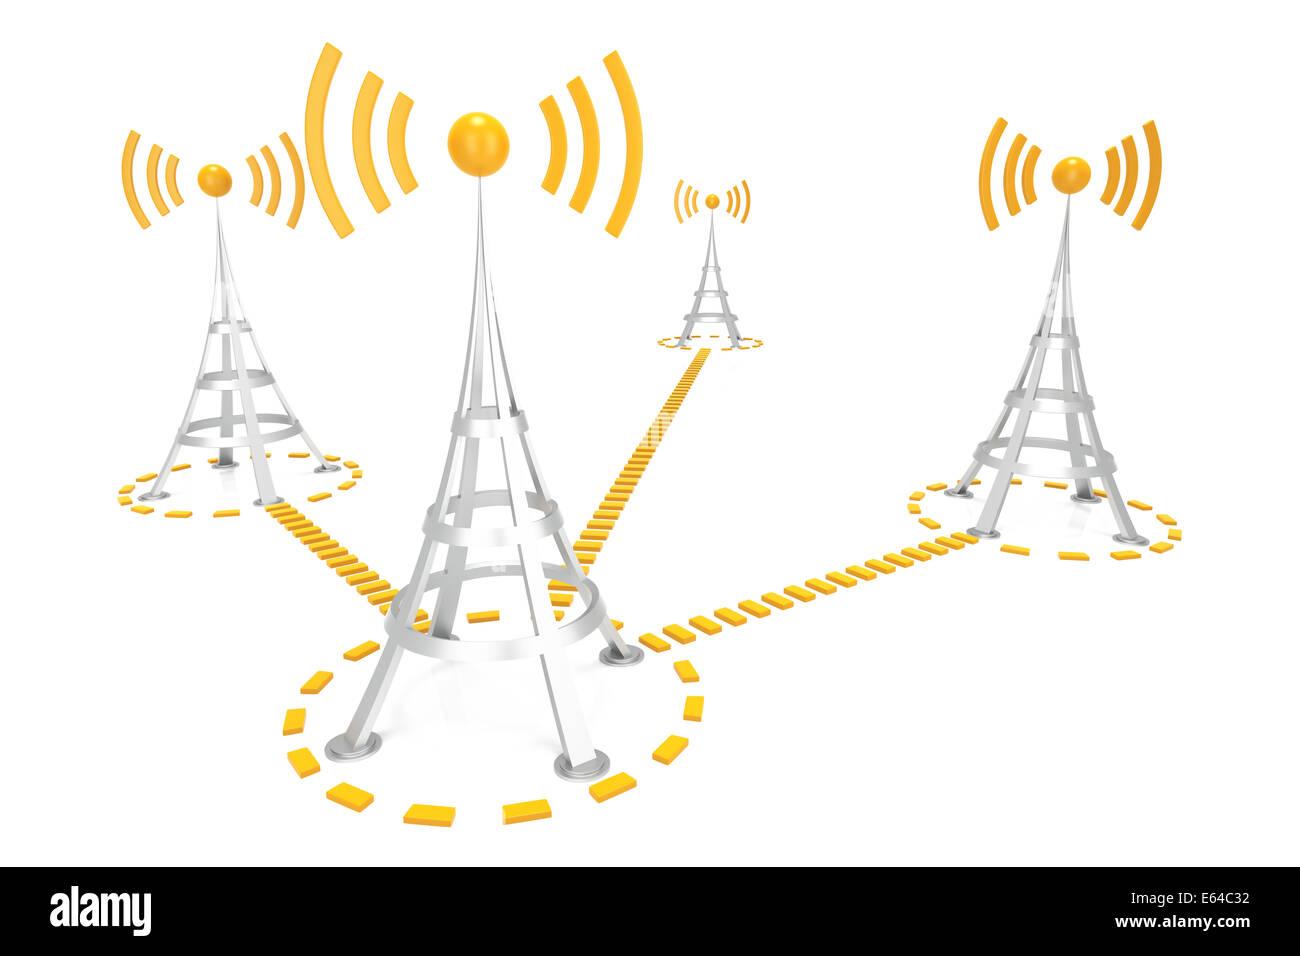 Wifi Network - Stock Image